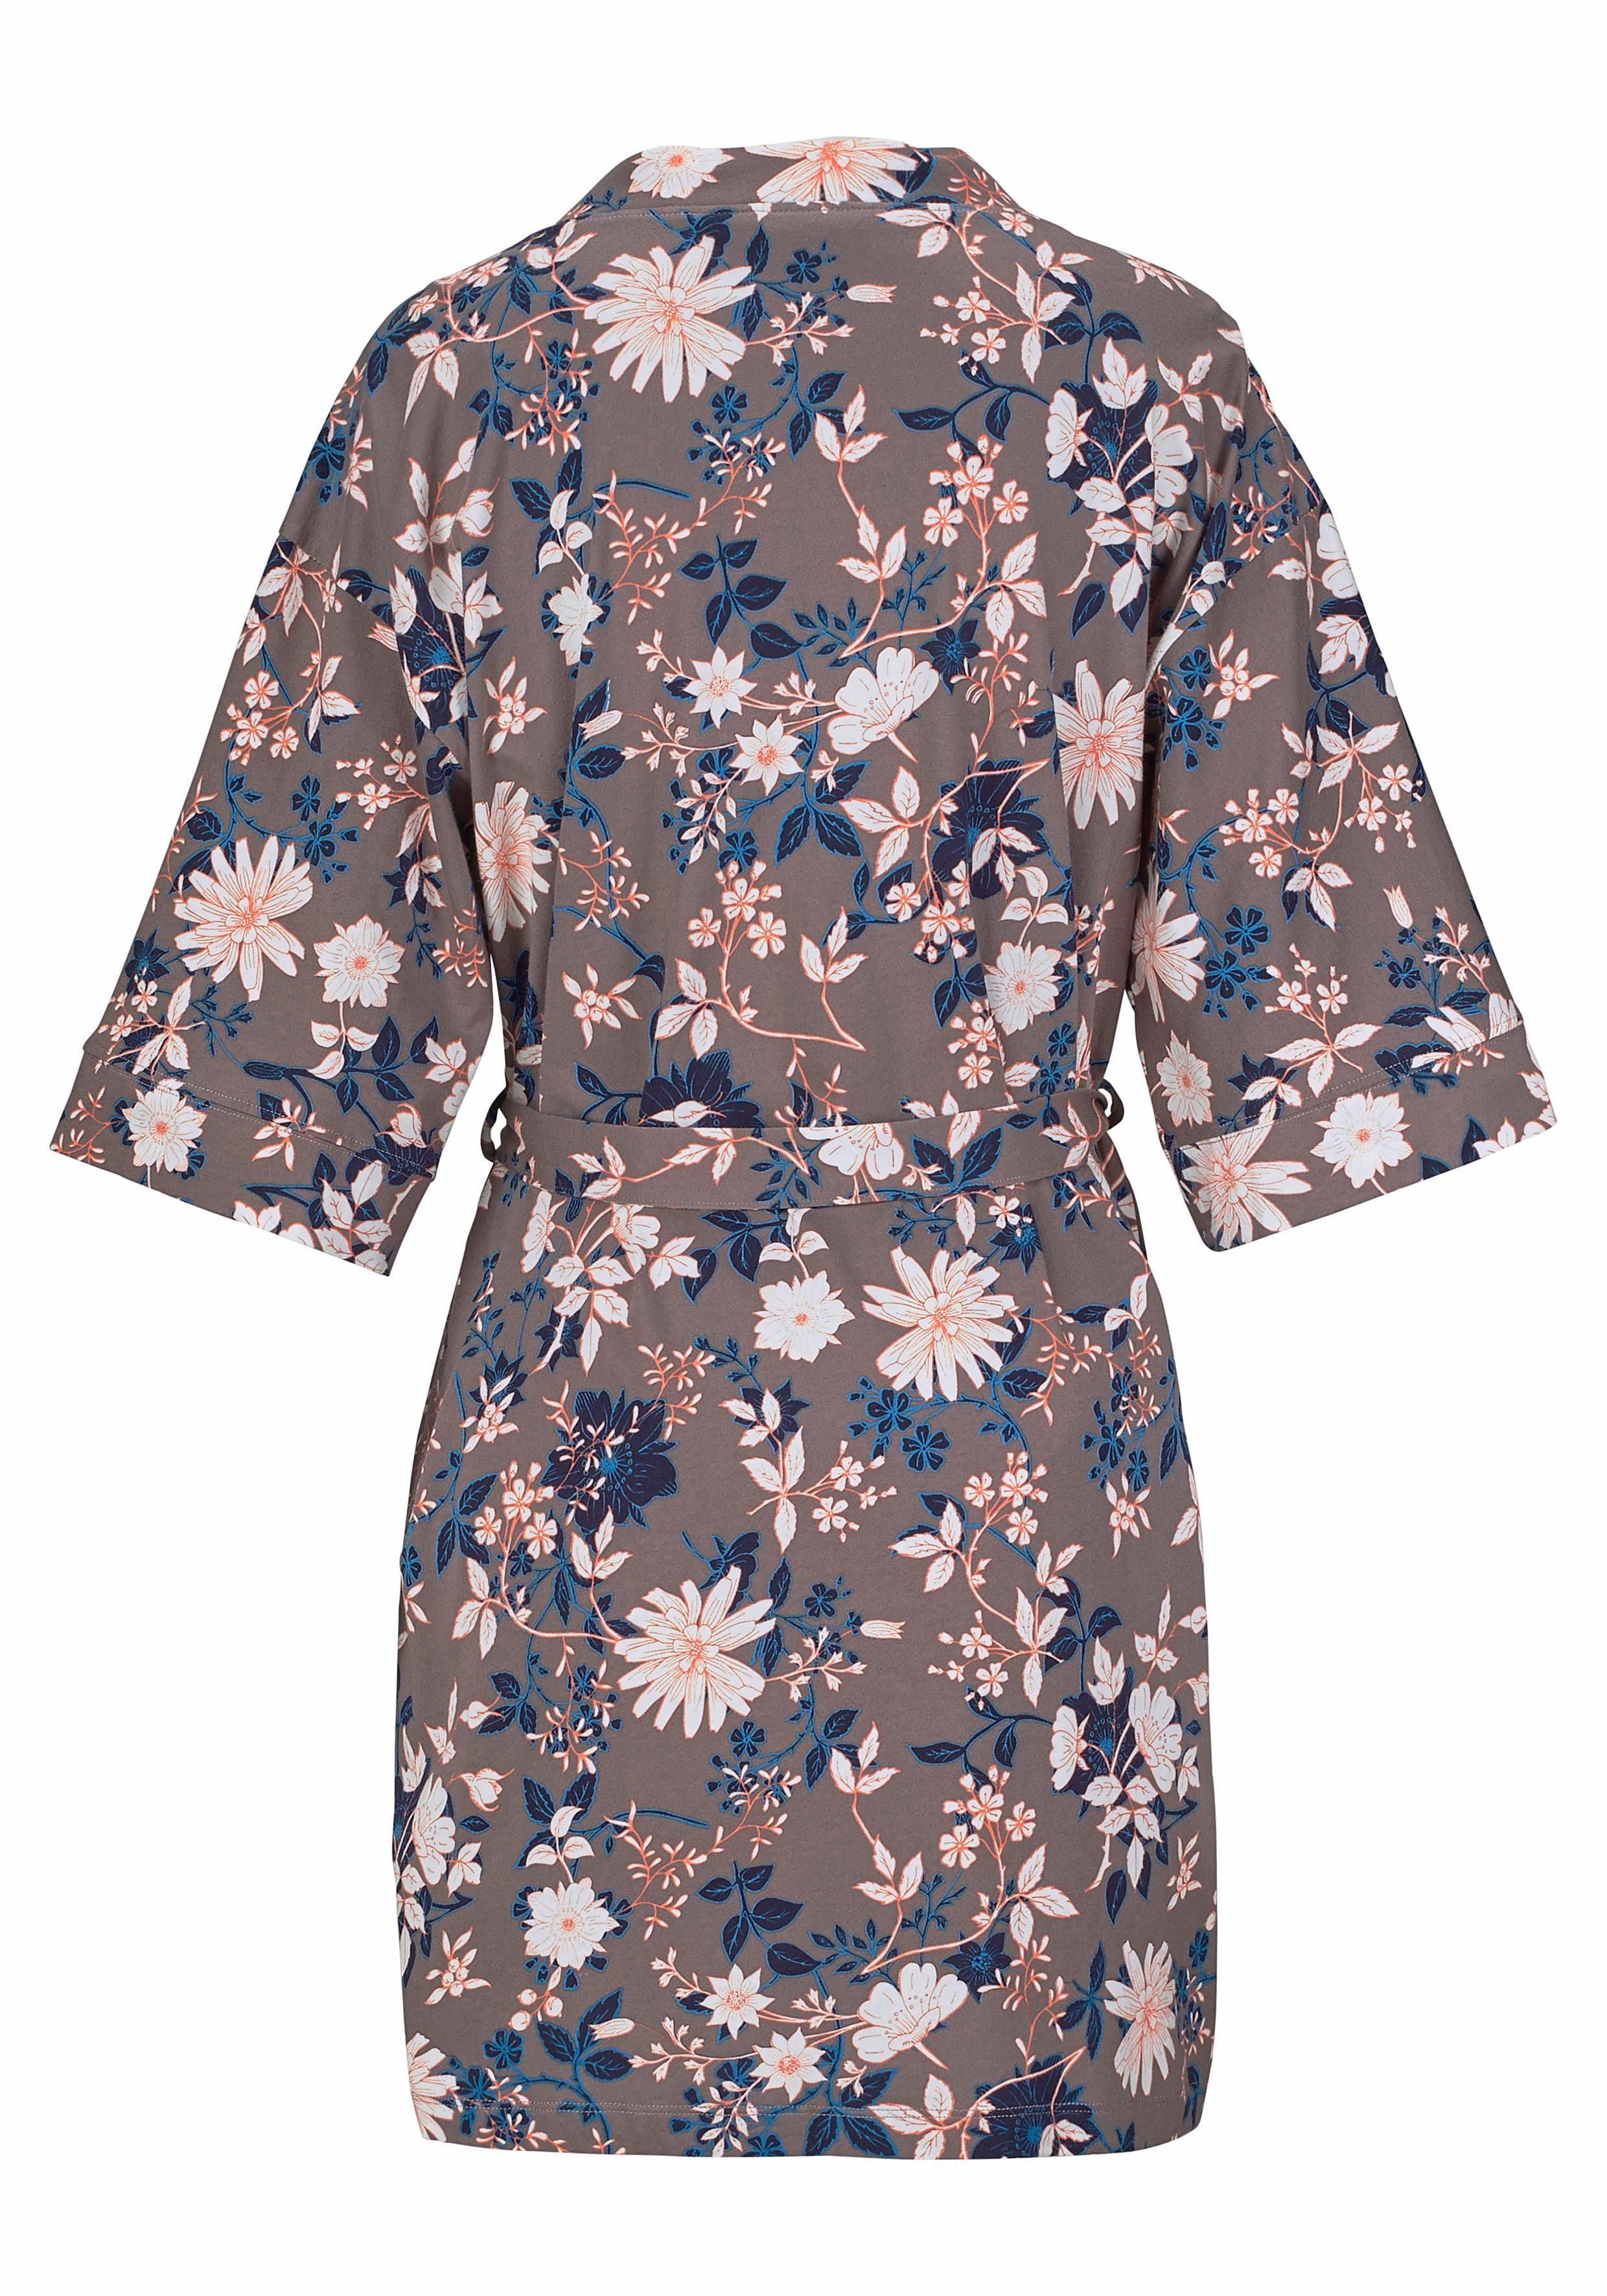 Webshop Label Kimono S Bodywear De Red In oliver Bloemenprint Met ZPkiTOuX